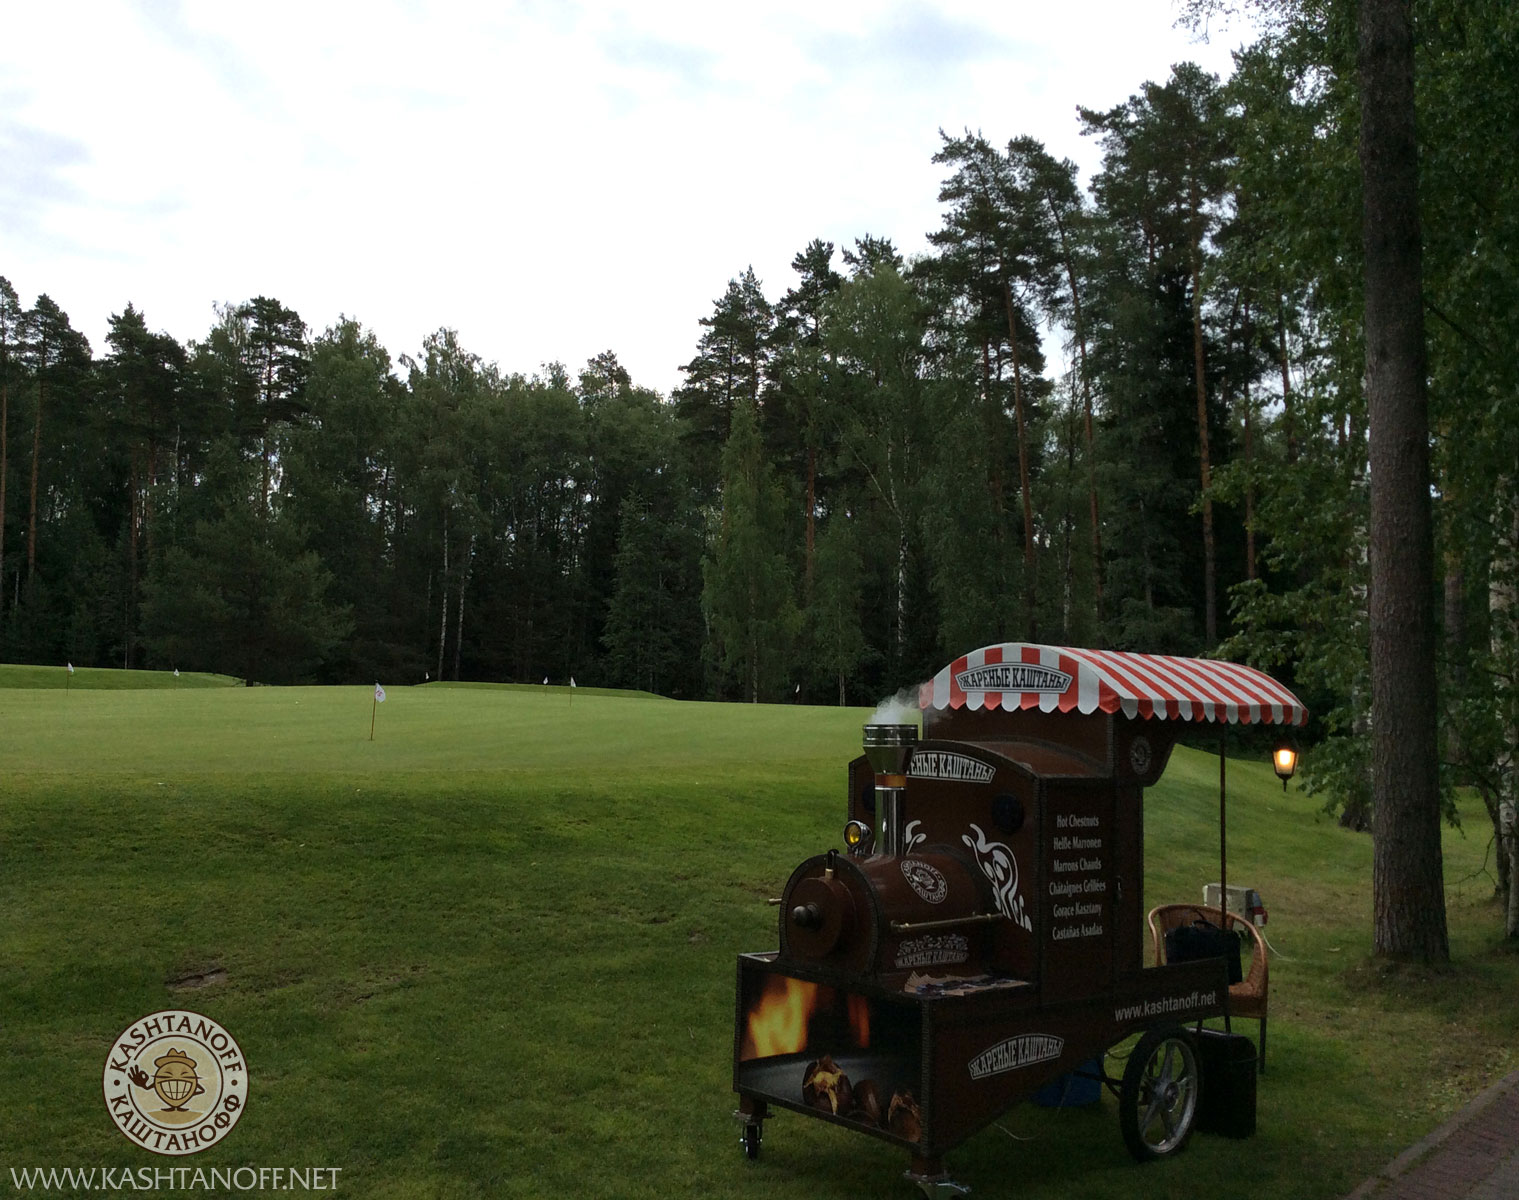 КаштаноФФ - Жареные каштаны в Moscow Country Club